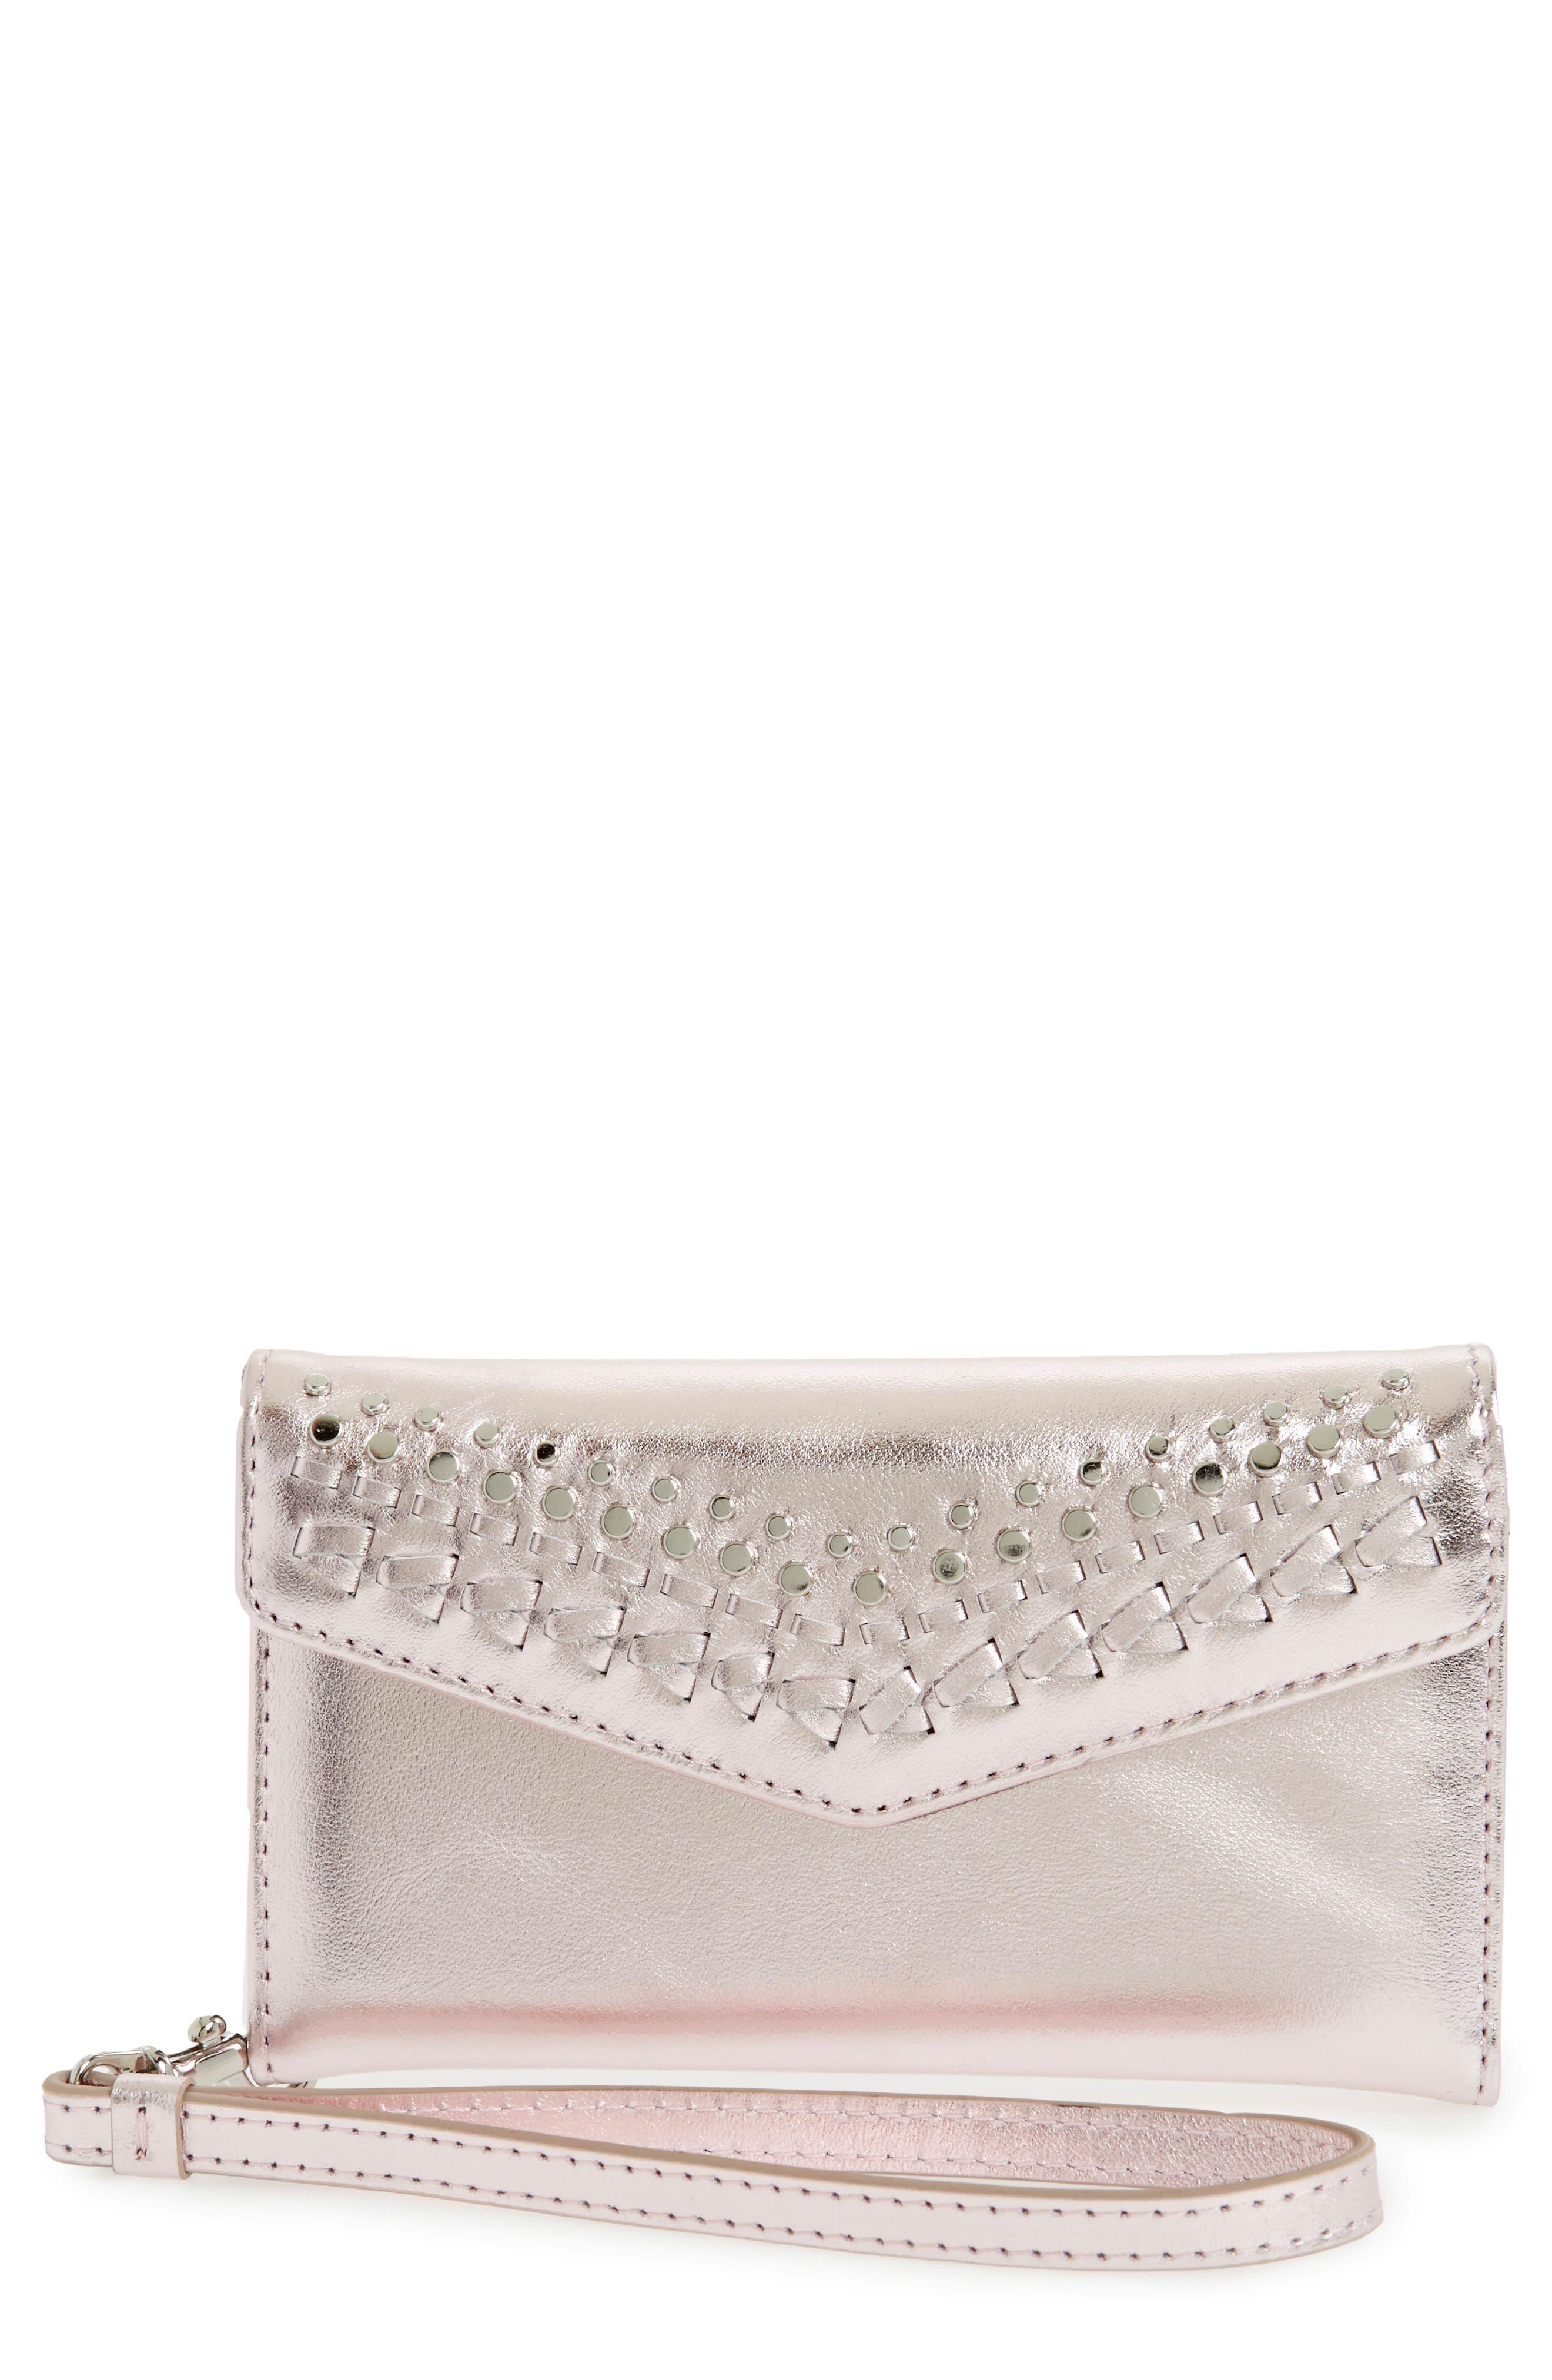 REBECCA MINKOFF Leather Whipstitch iPhone 7 Wristlet